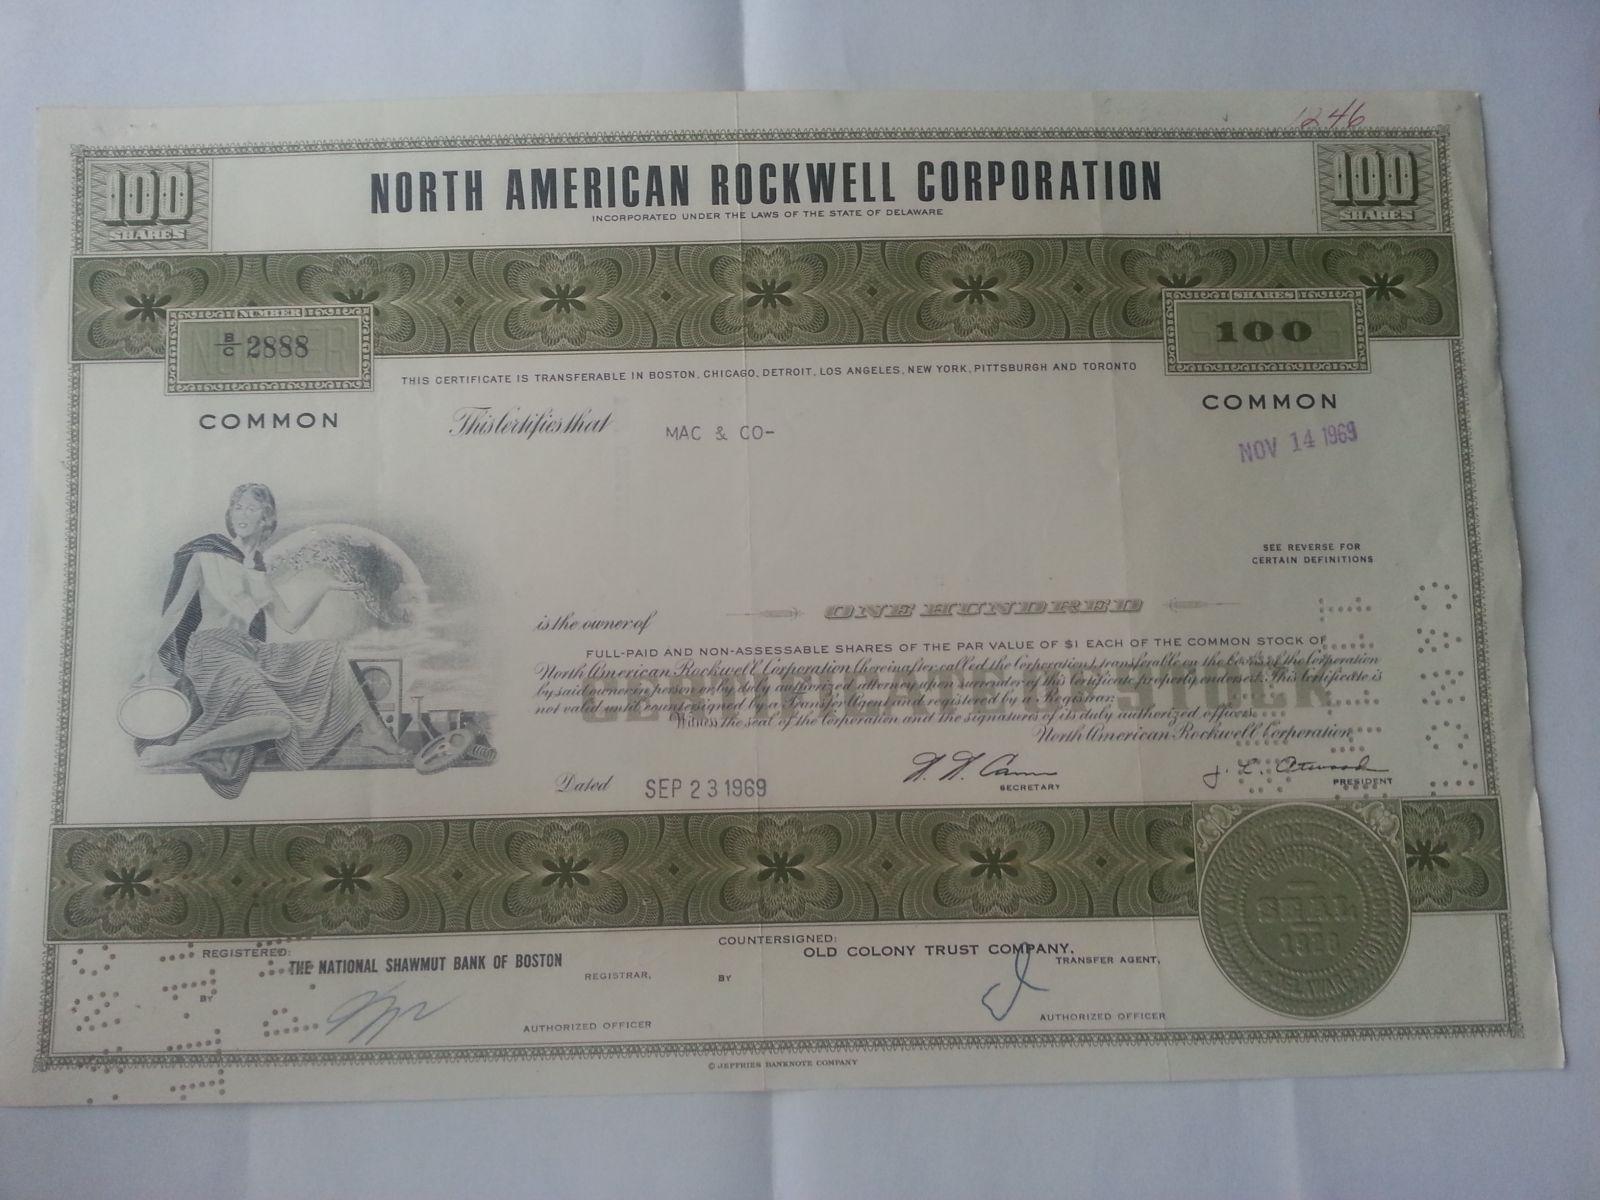 USA-akcie, Rockwel Corporation, 1969, USA